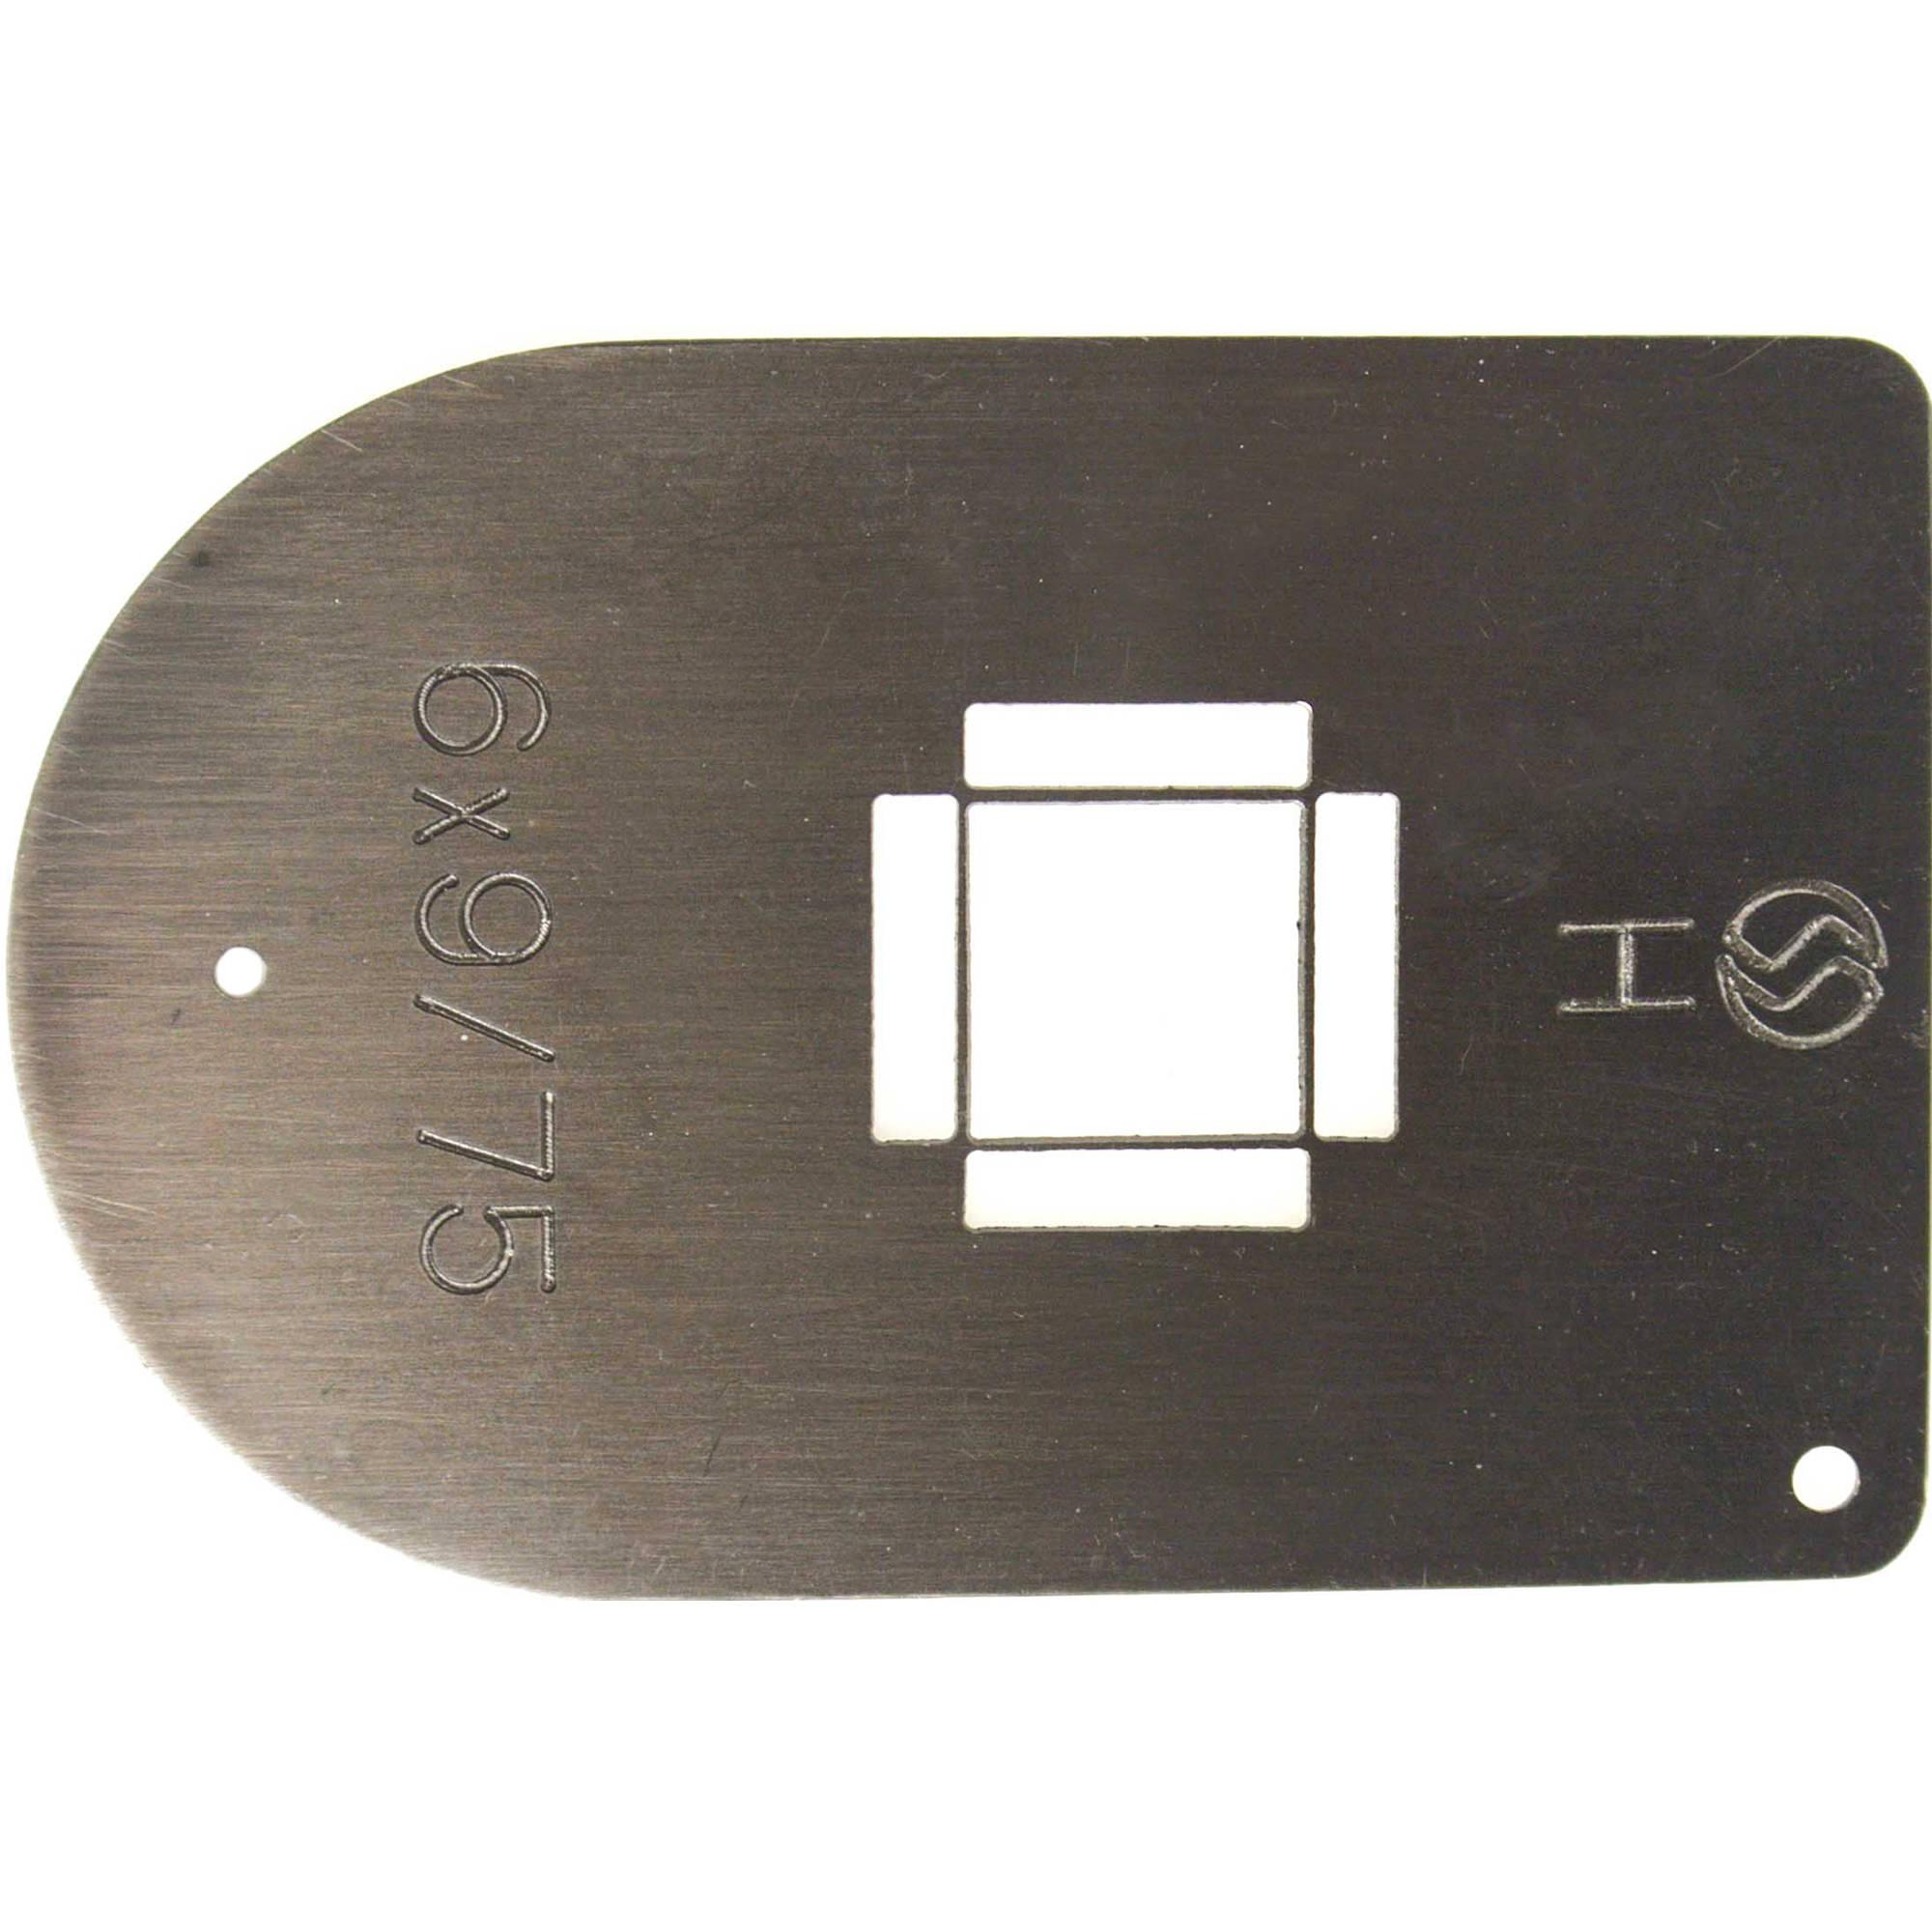 Silvestri 6 X 9 Viewfinder Frame For Silvestri H 1031 Bh